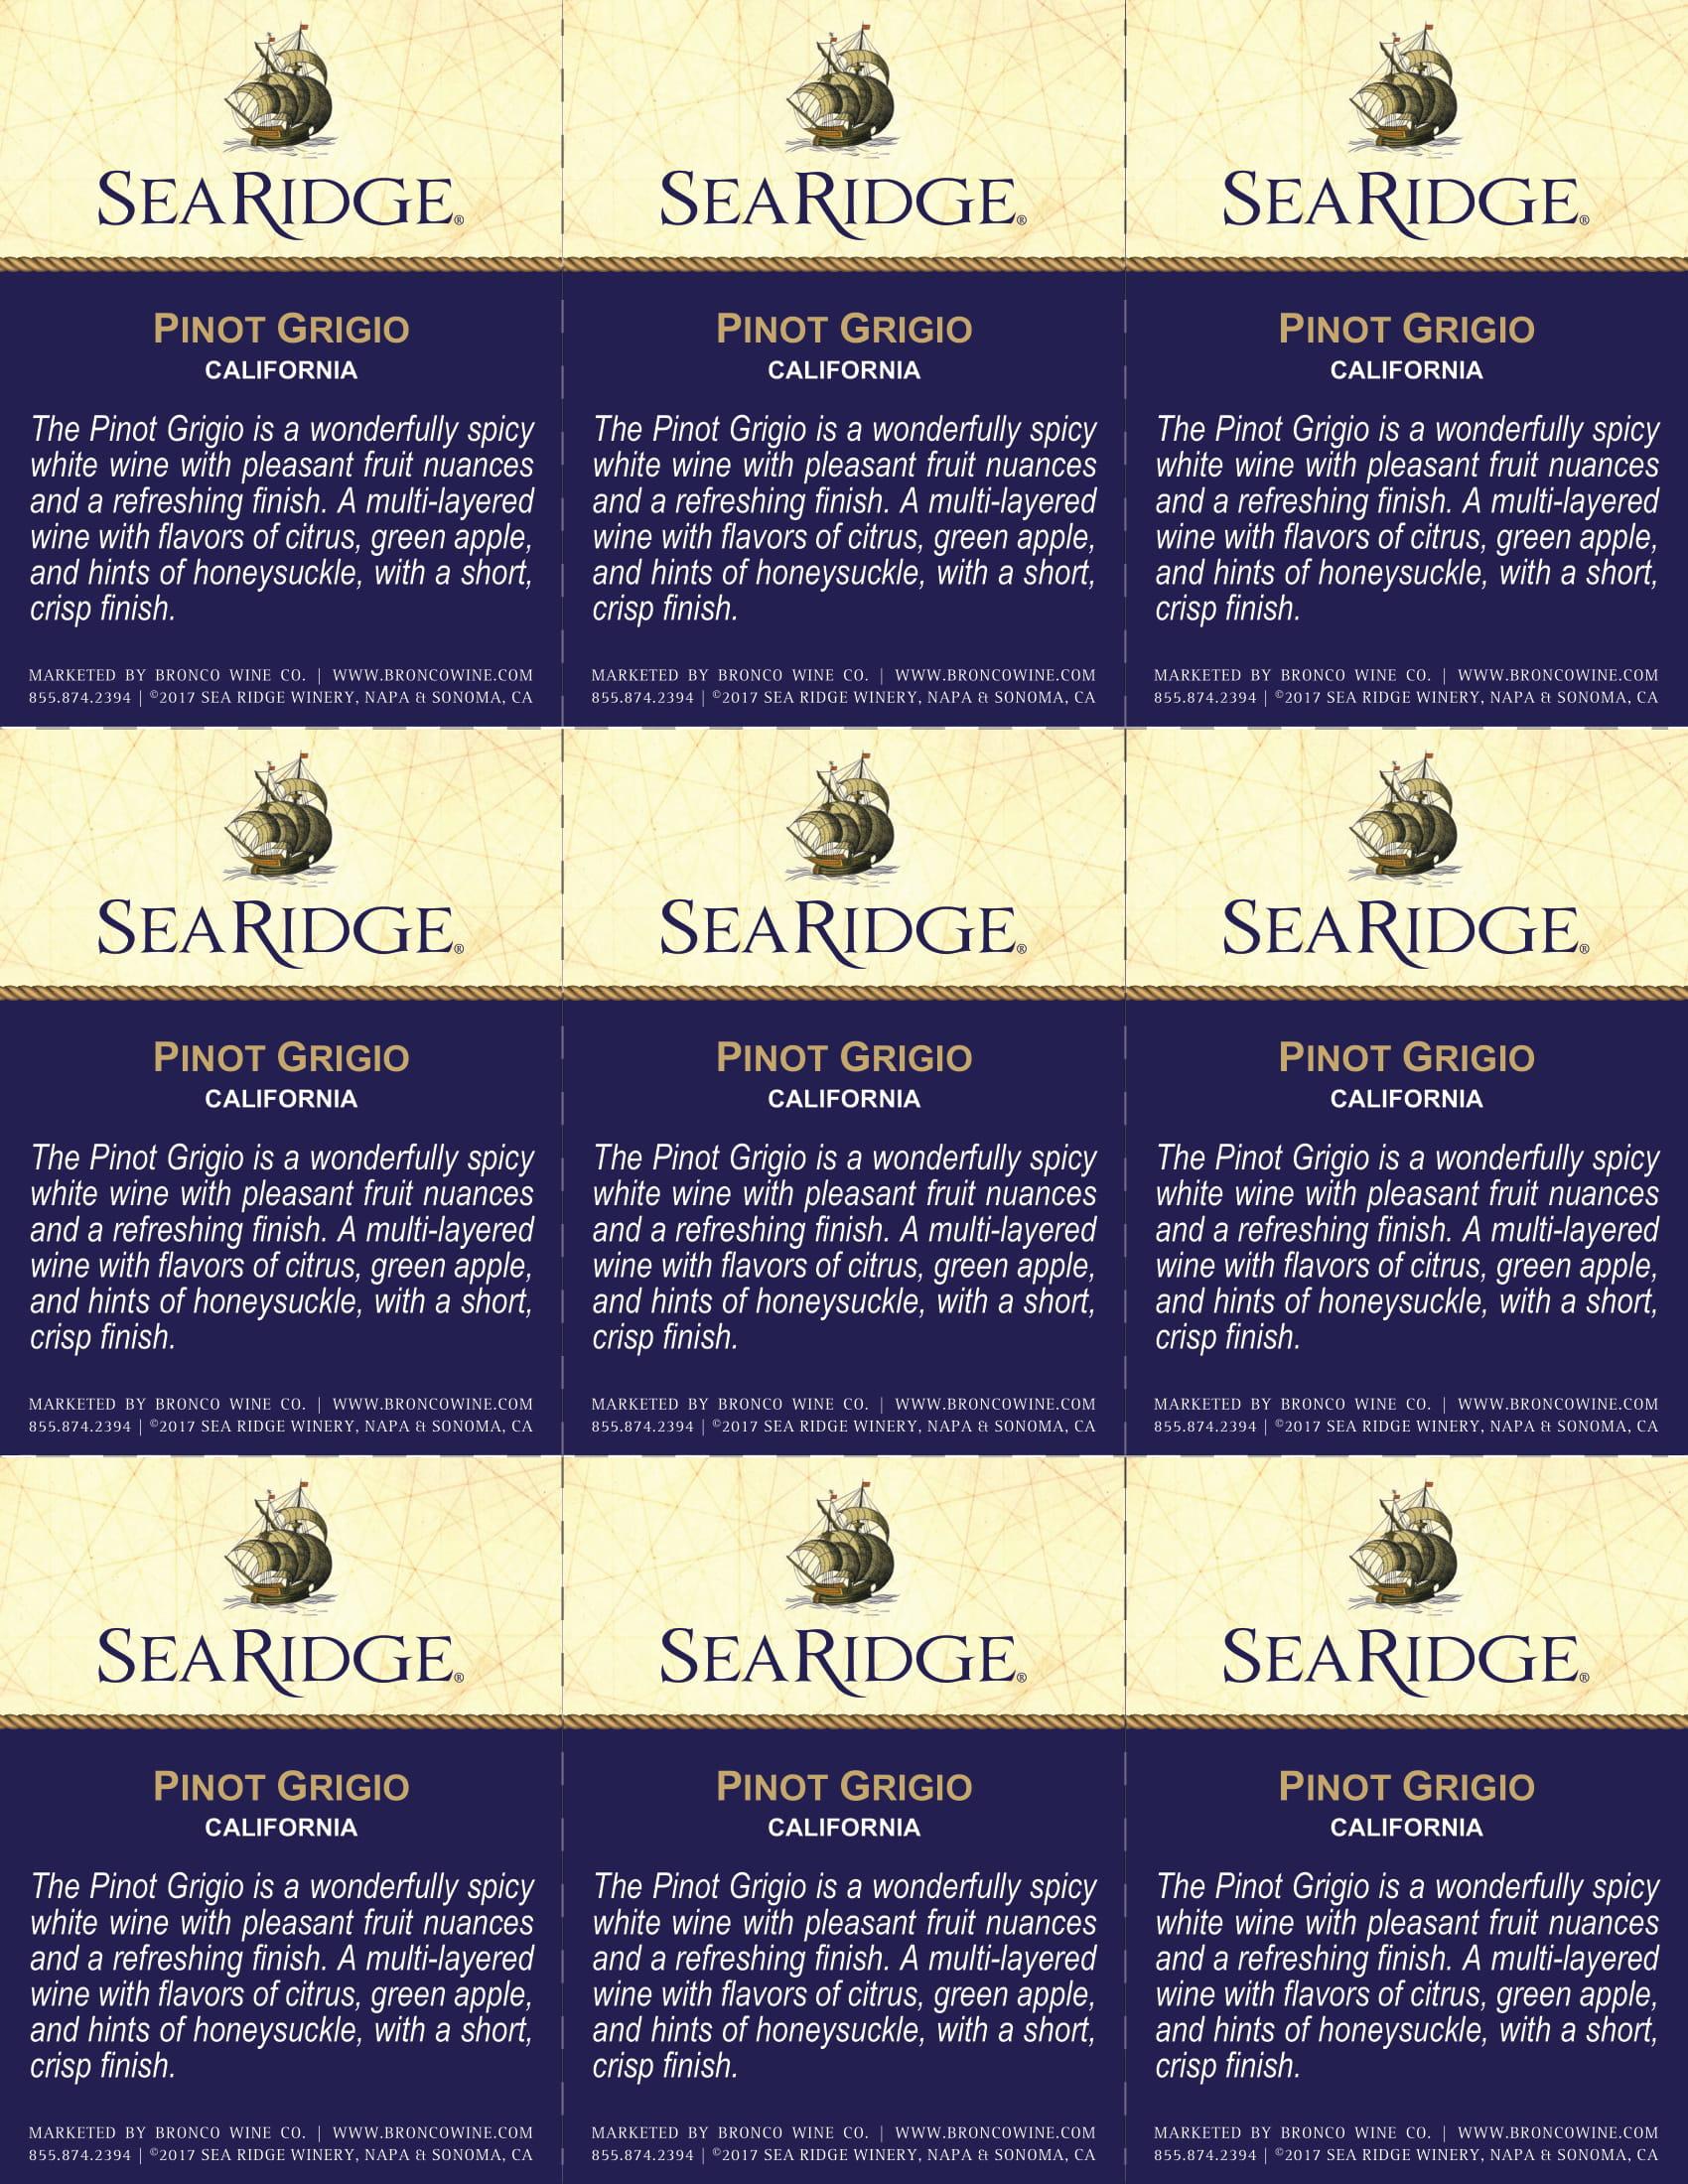 Sea Ridge Pinot Grigio Shelf Talker